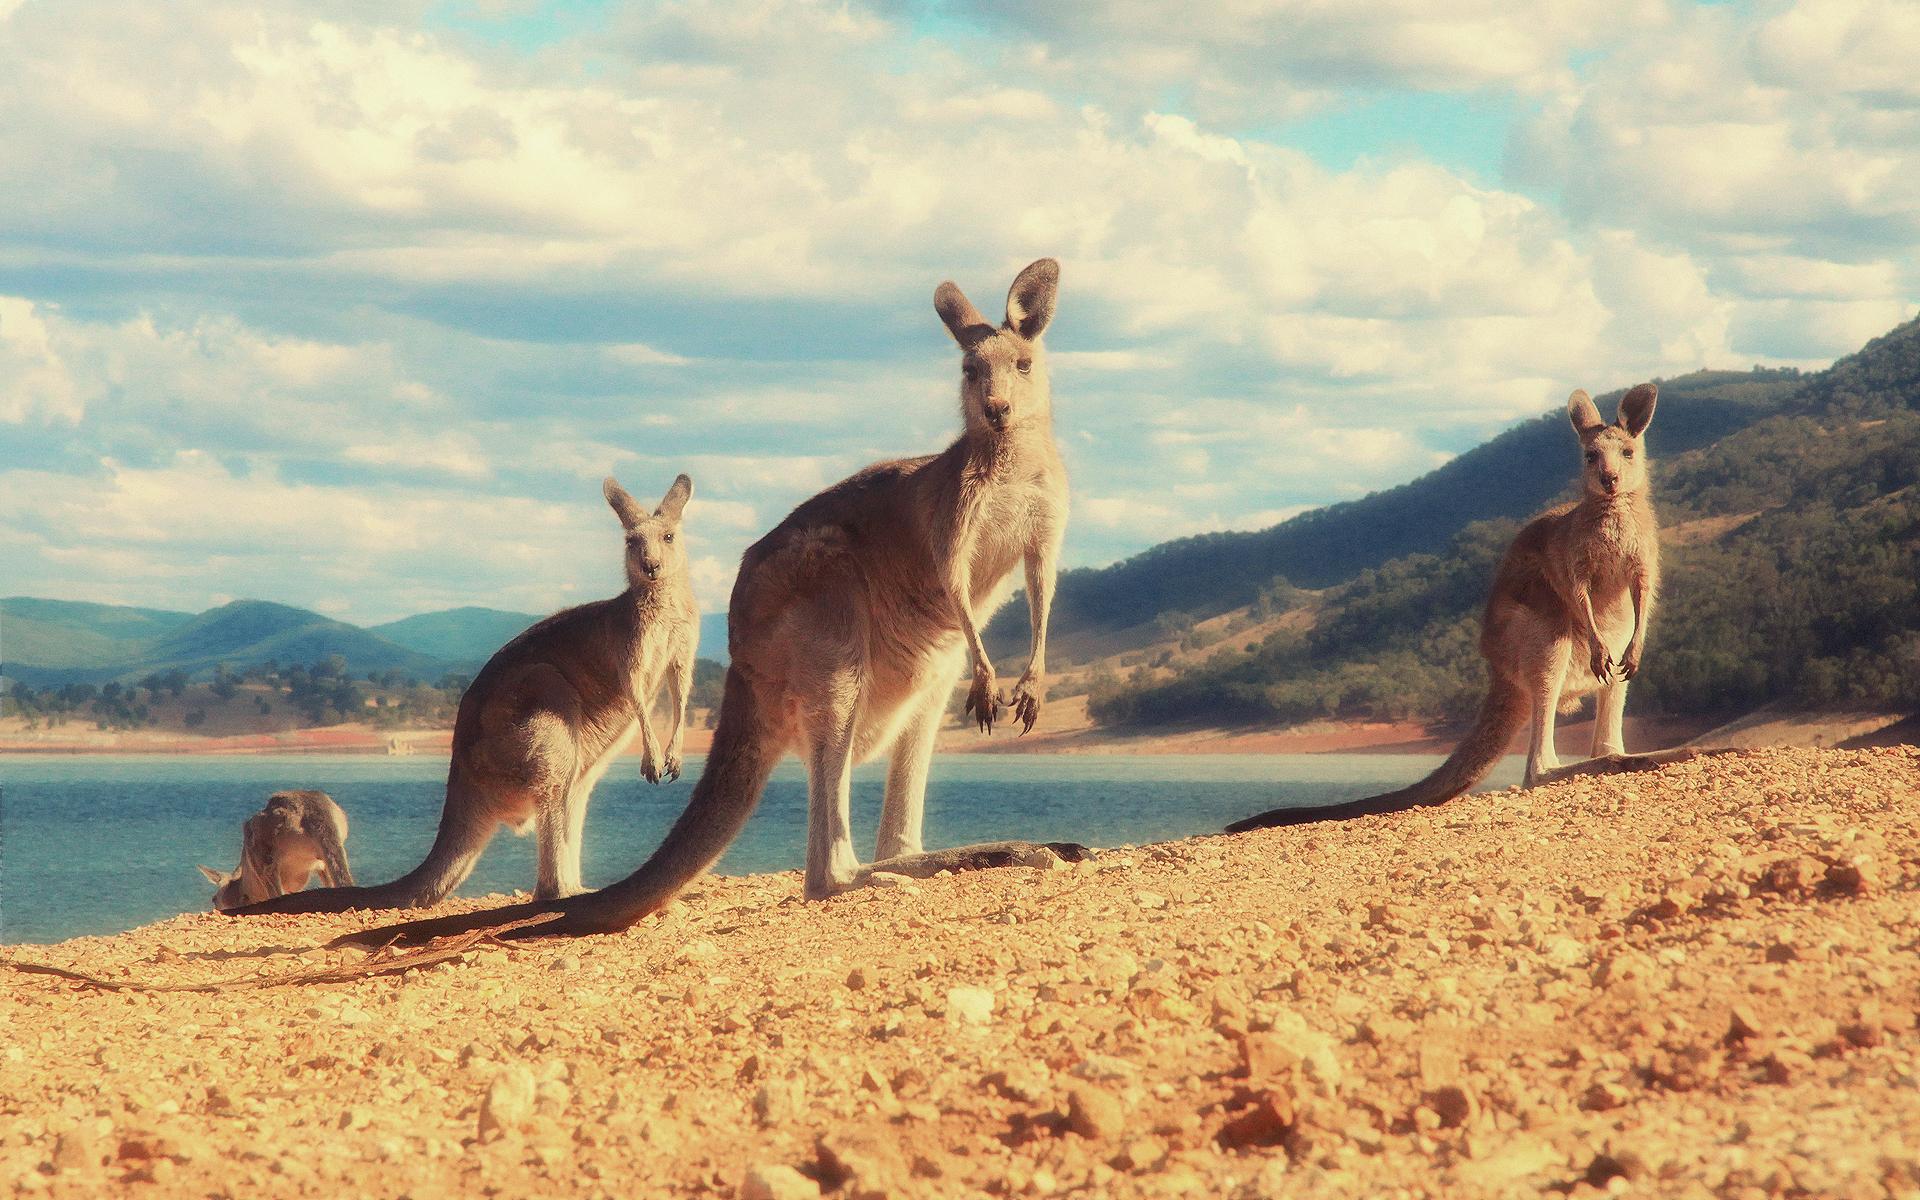 Australian Flag Hd Wallpaper Kangaroo Hd Wallpaper Background Image 1920x1200 Id